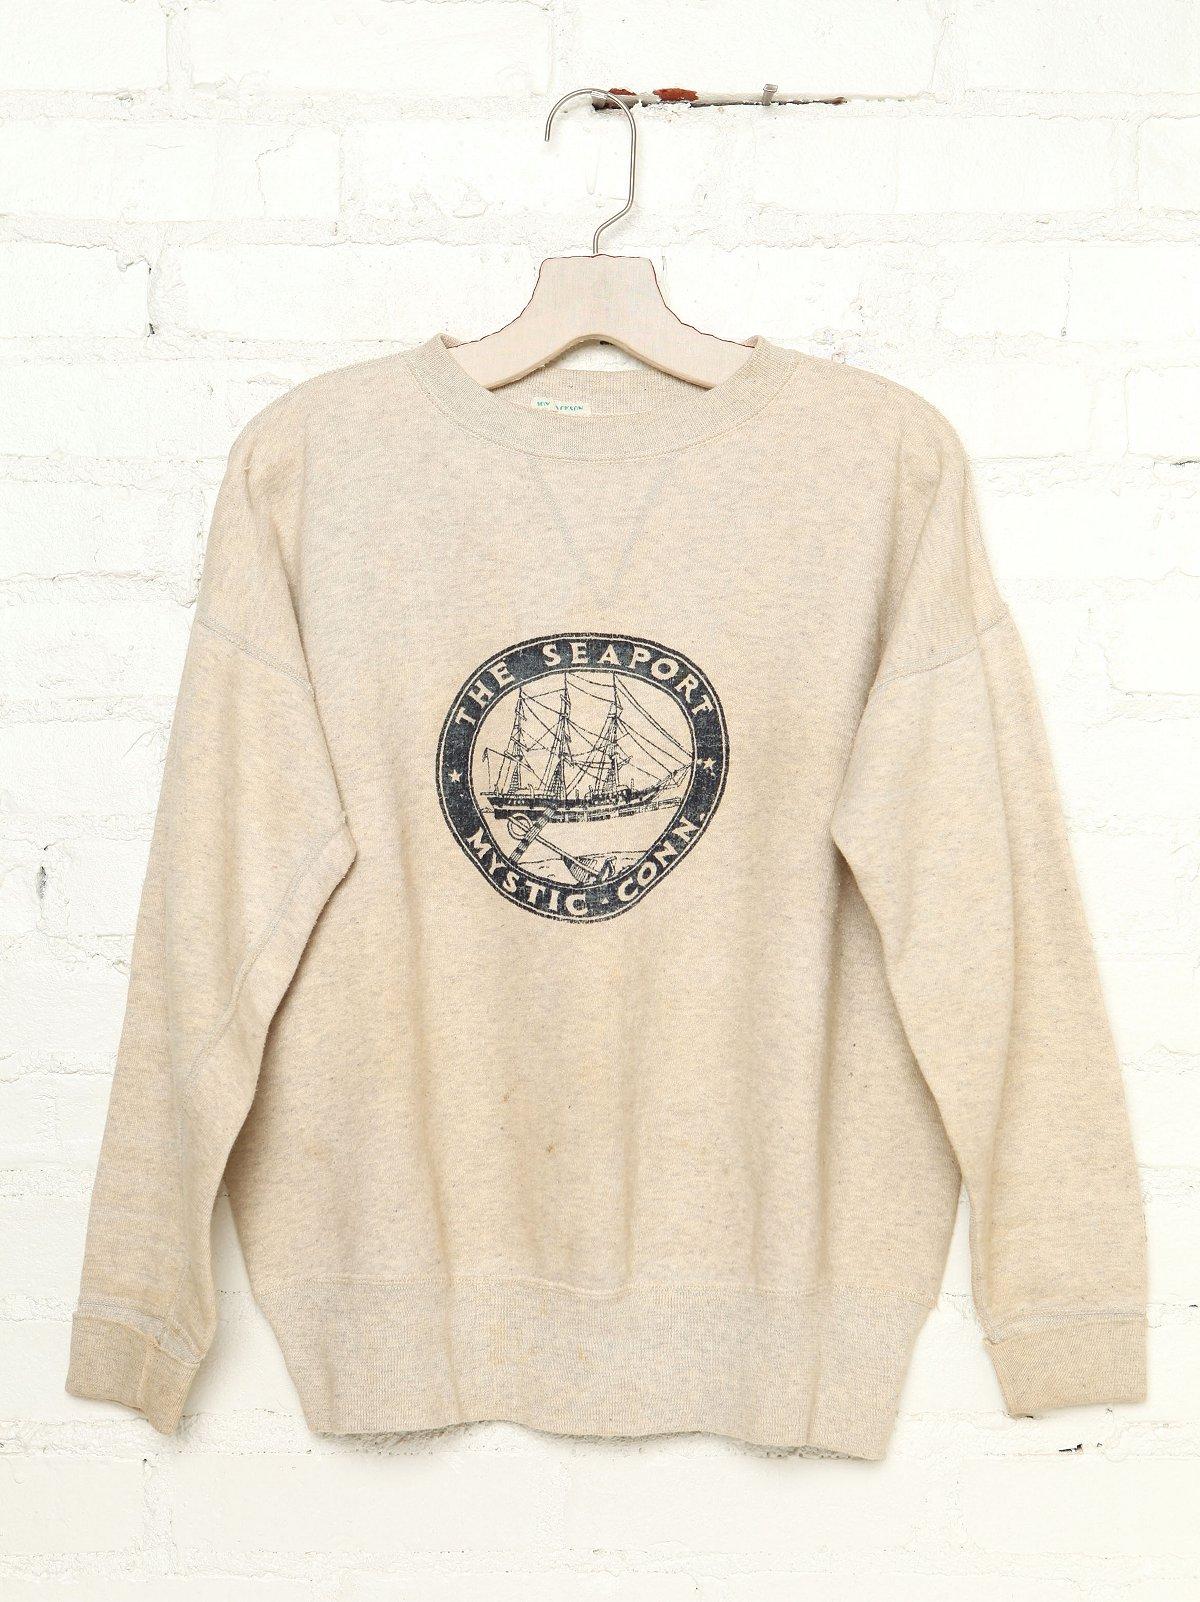 Vintage The Seaport Mystic Sweatshirt